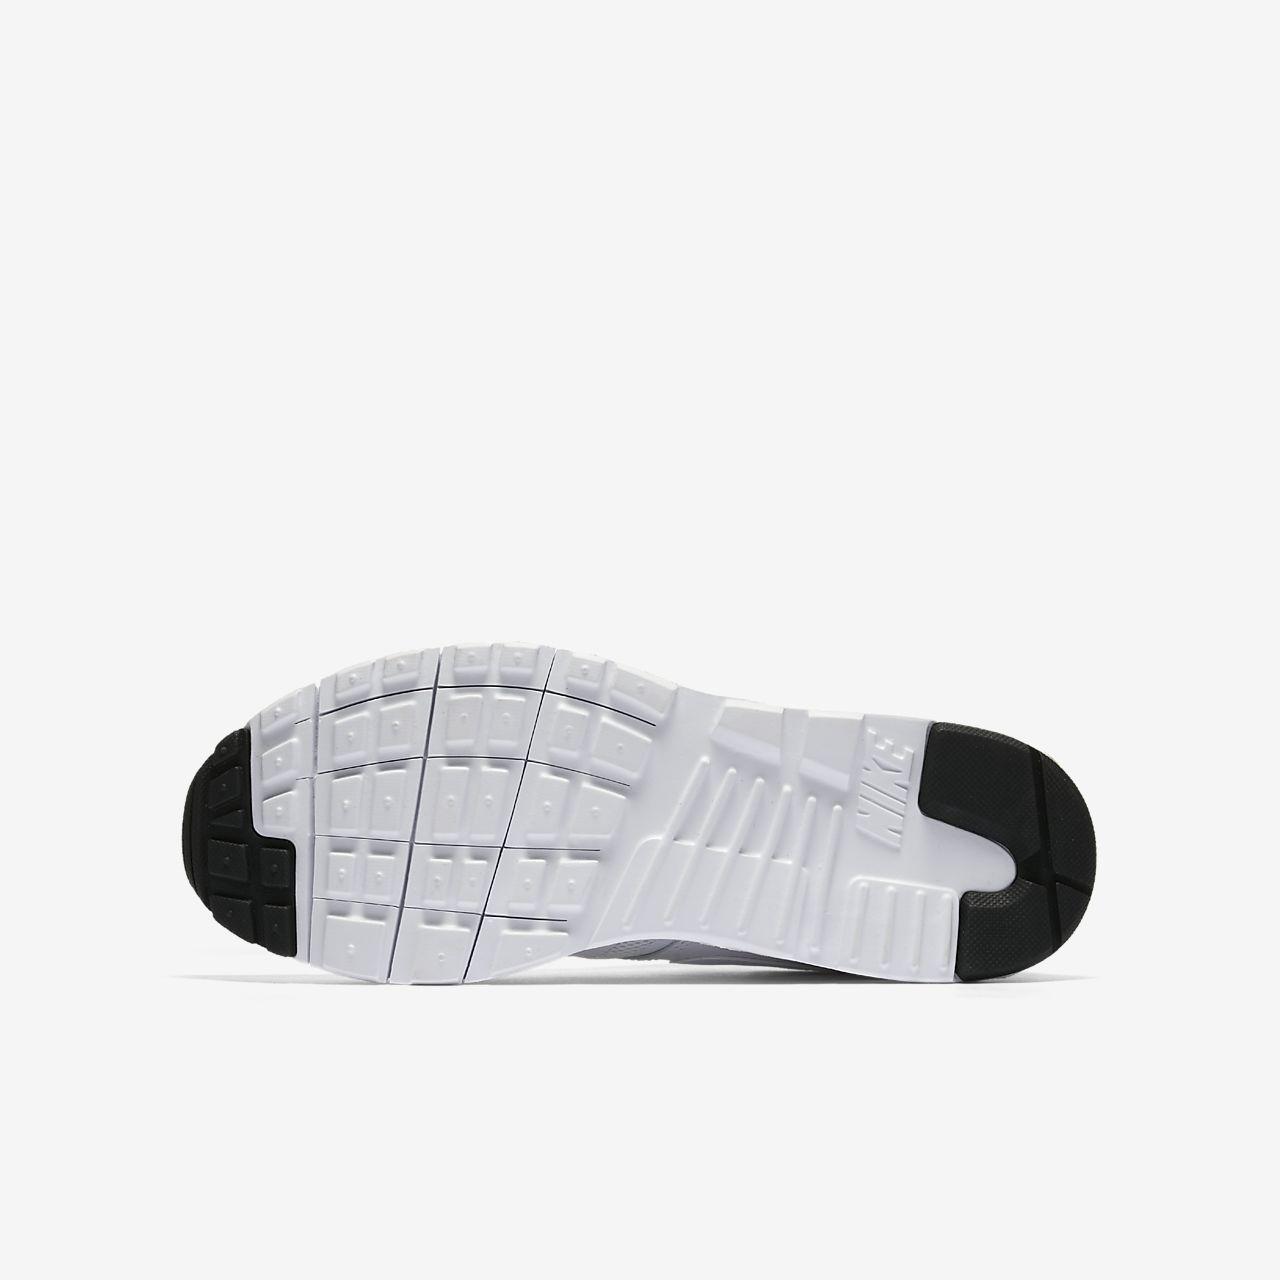 59ee610f Кроссовки для школьников Nike Air Max Vision. Nike.com RU